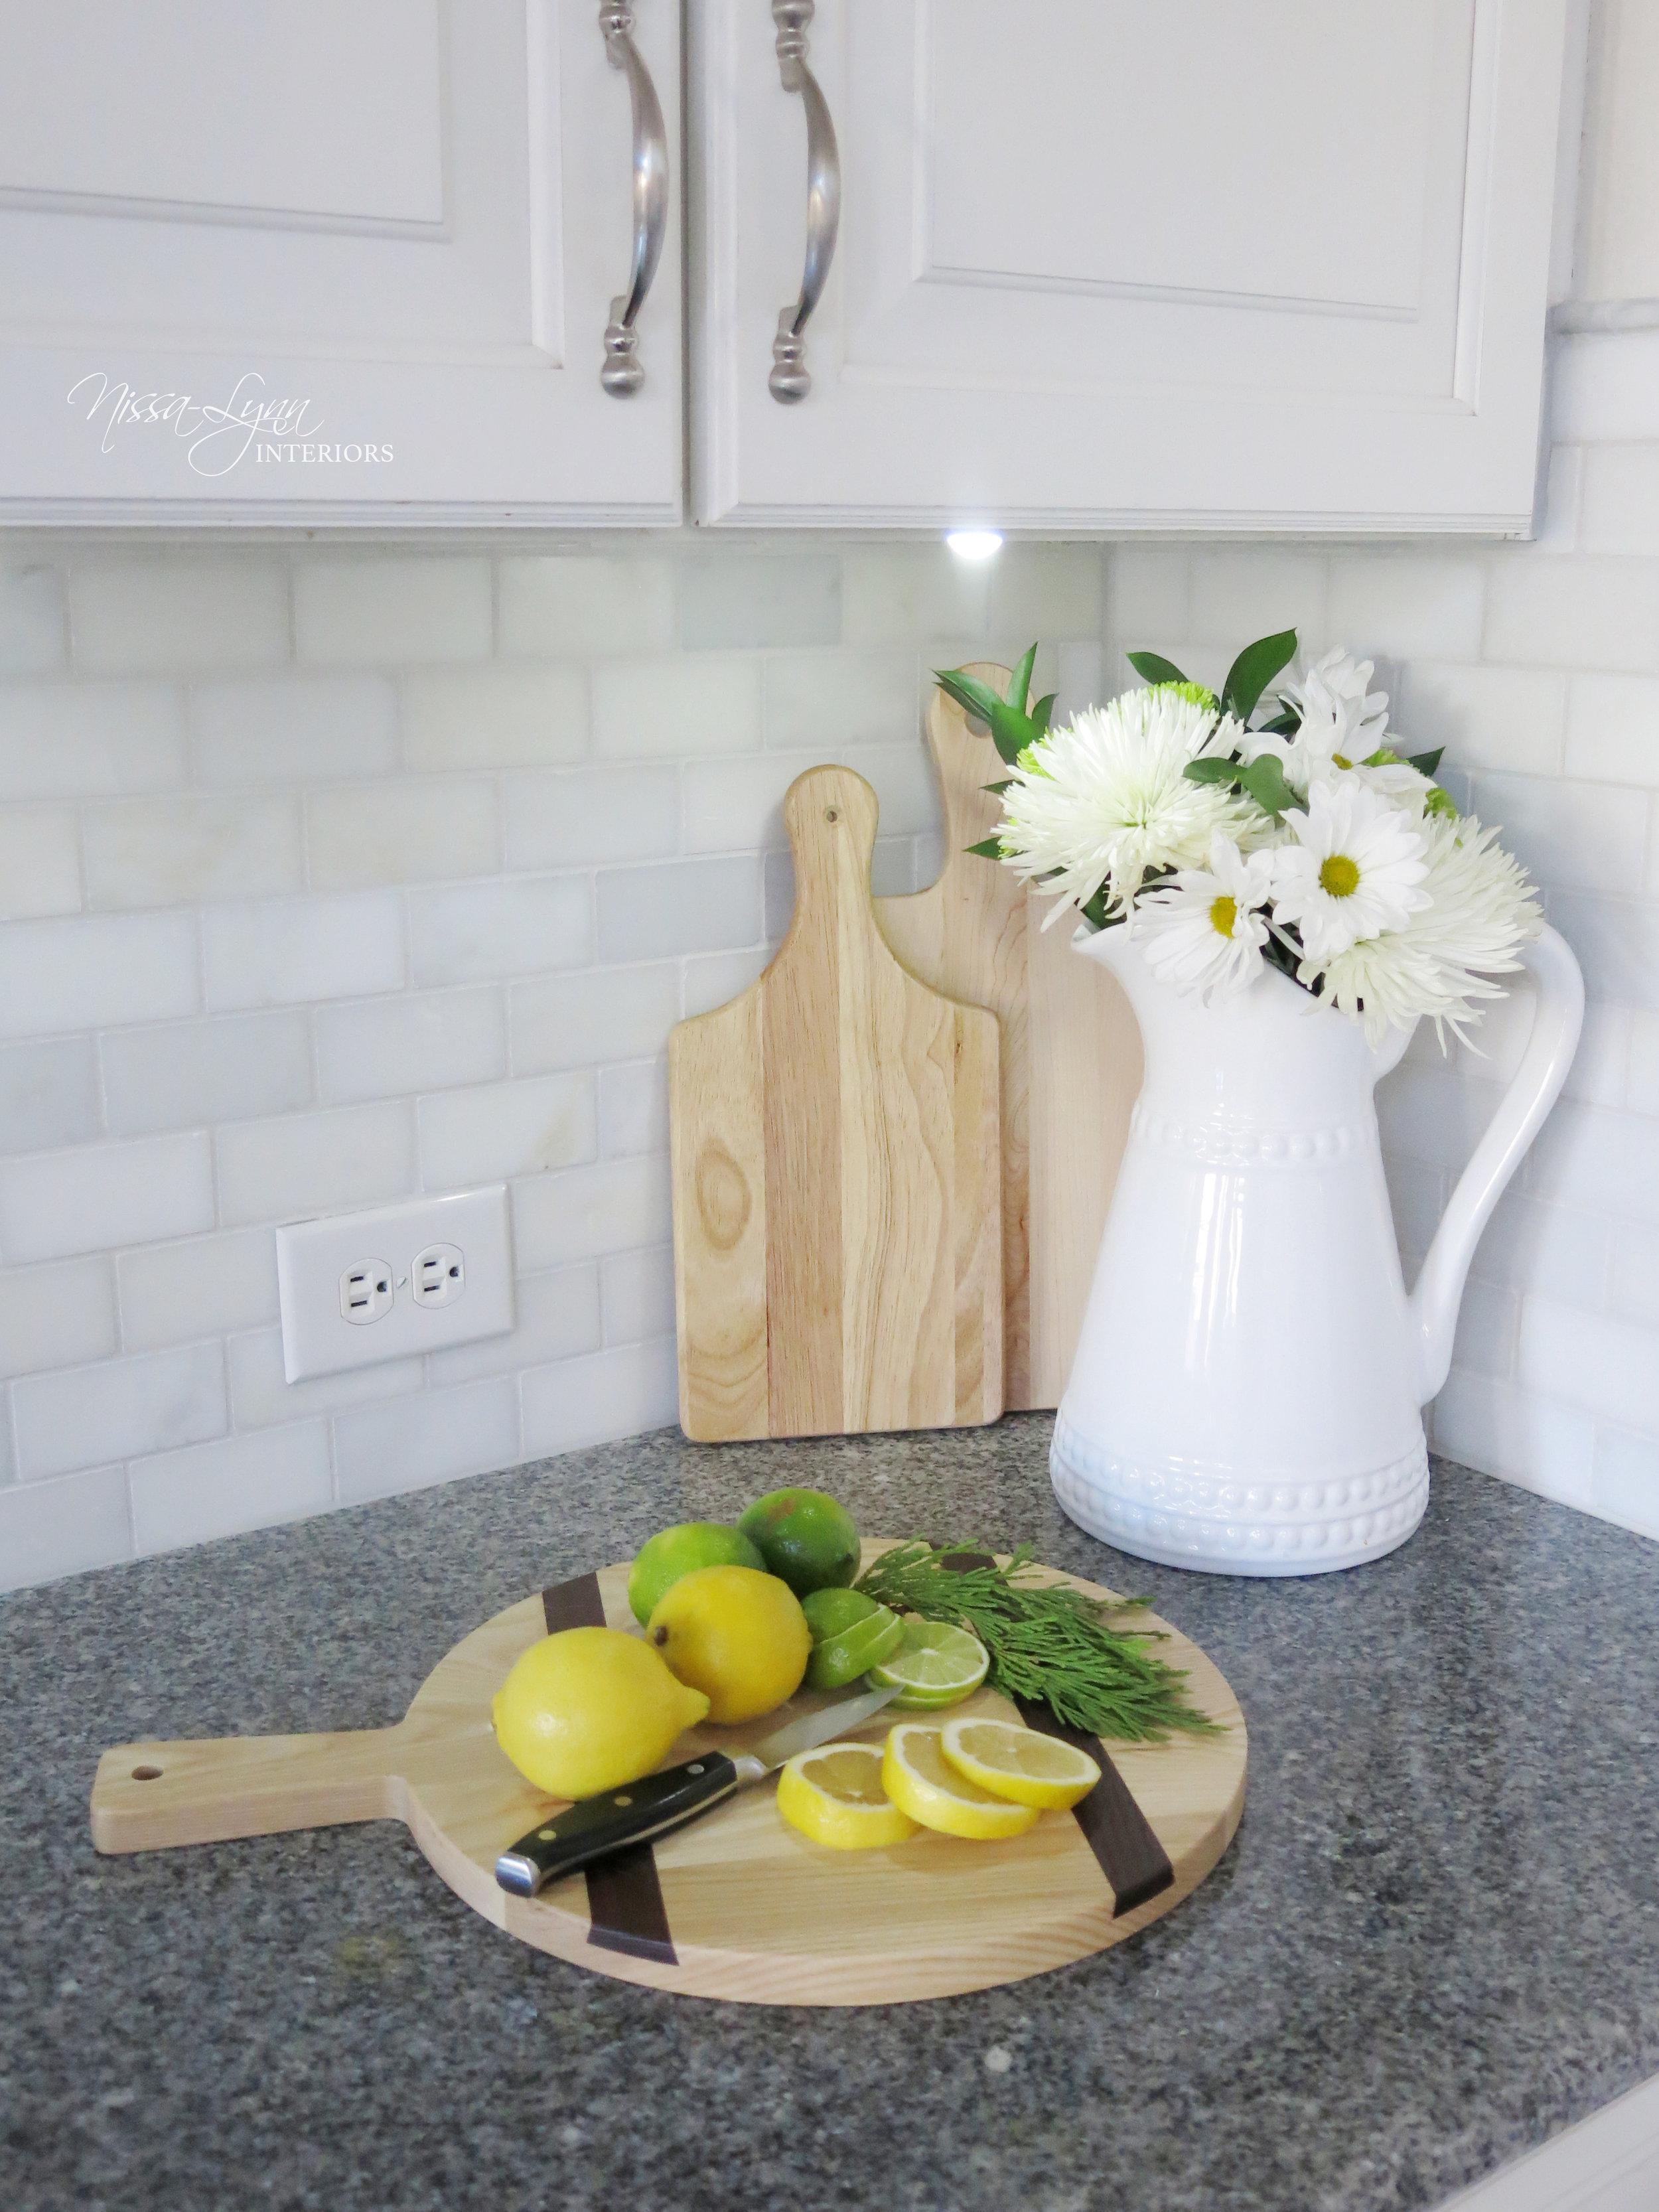 - New Kitchen Backsplash With Floor & Decor — Nissa-Lynn Interiors